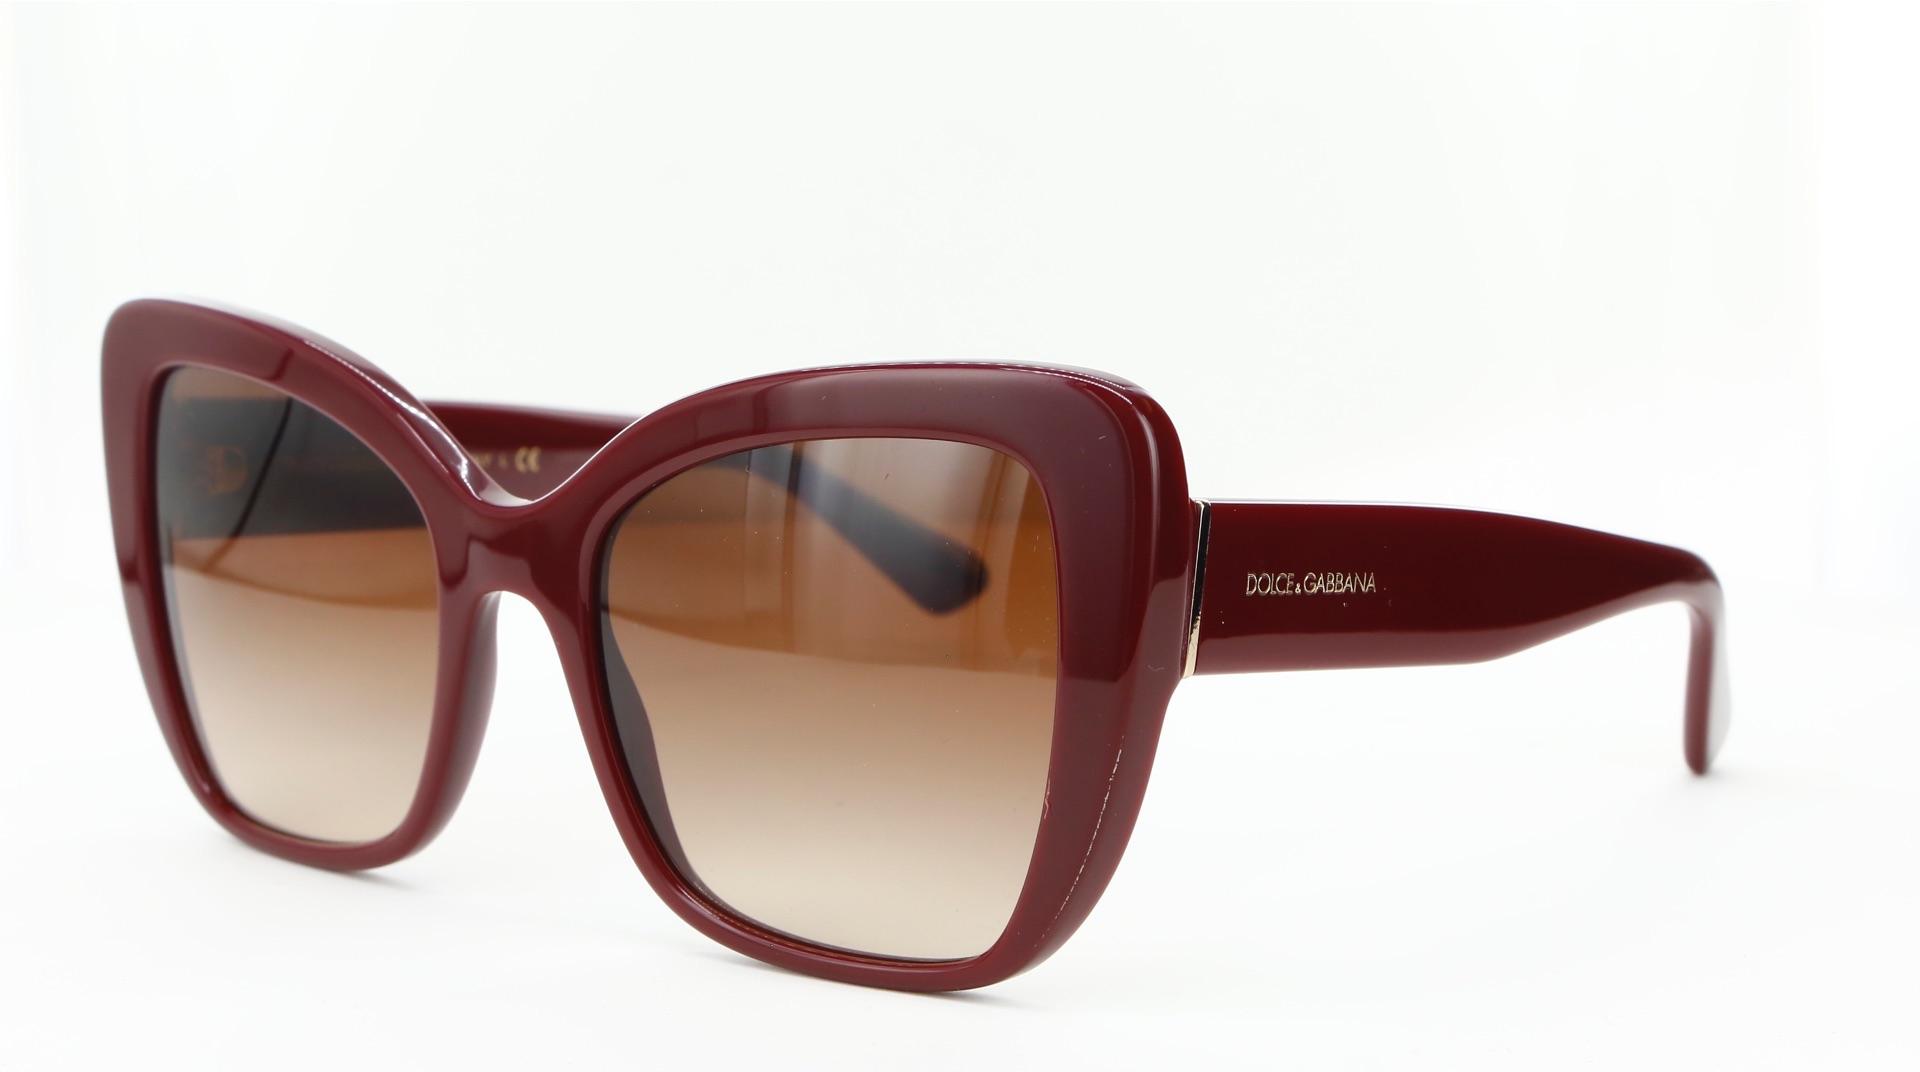 Dolce & Gabbana - ref: 82947